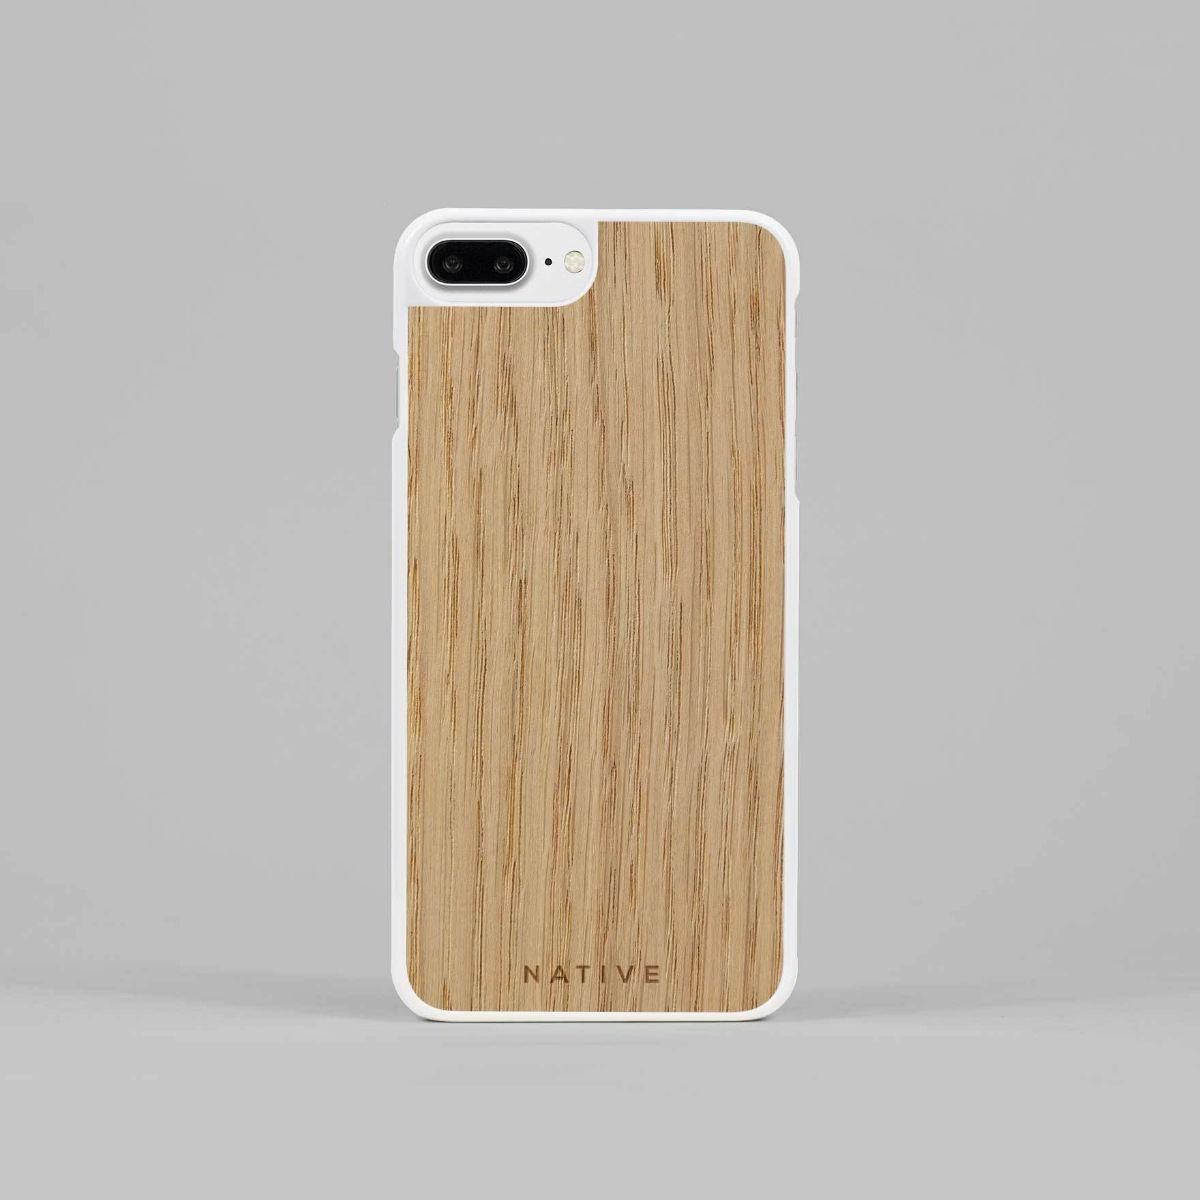 Bílý kryt na iPhone - Dub - 7 Plus